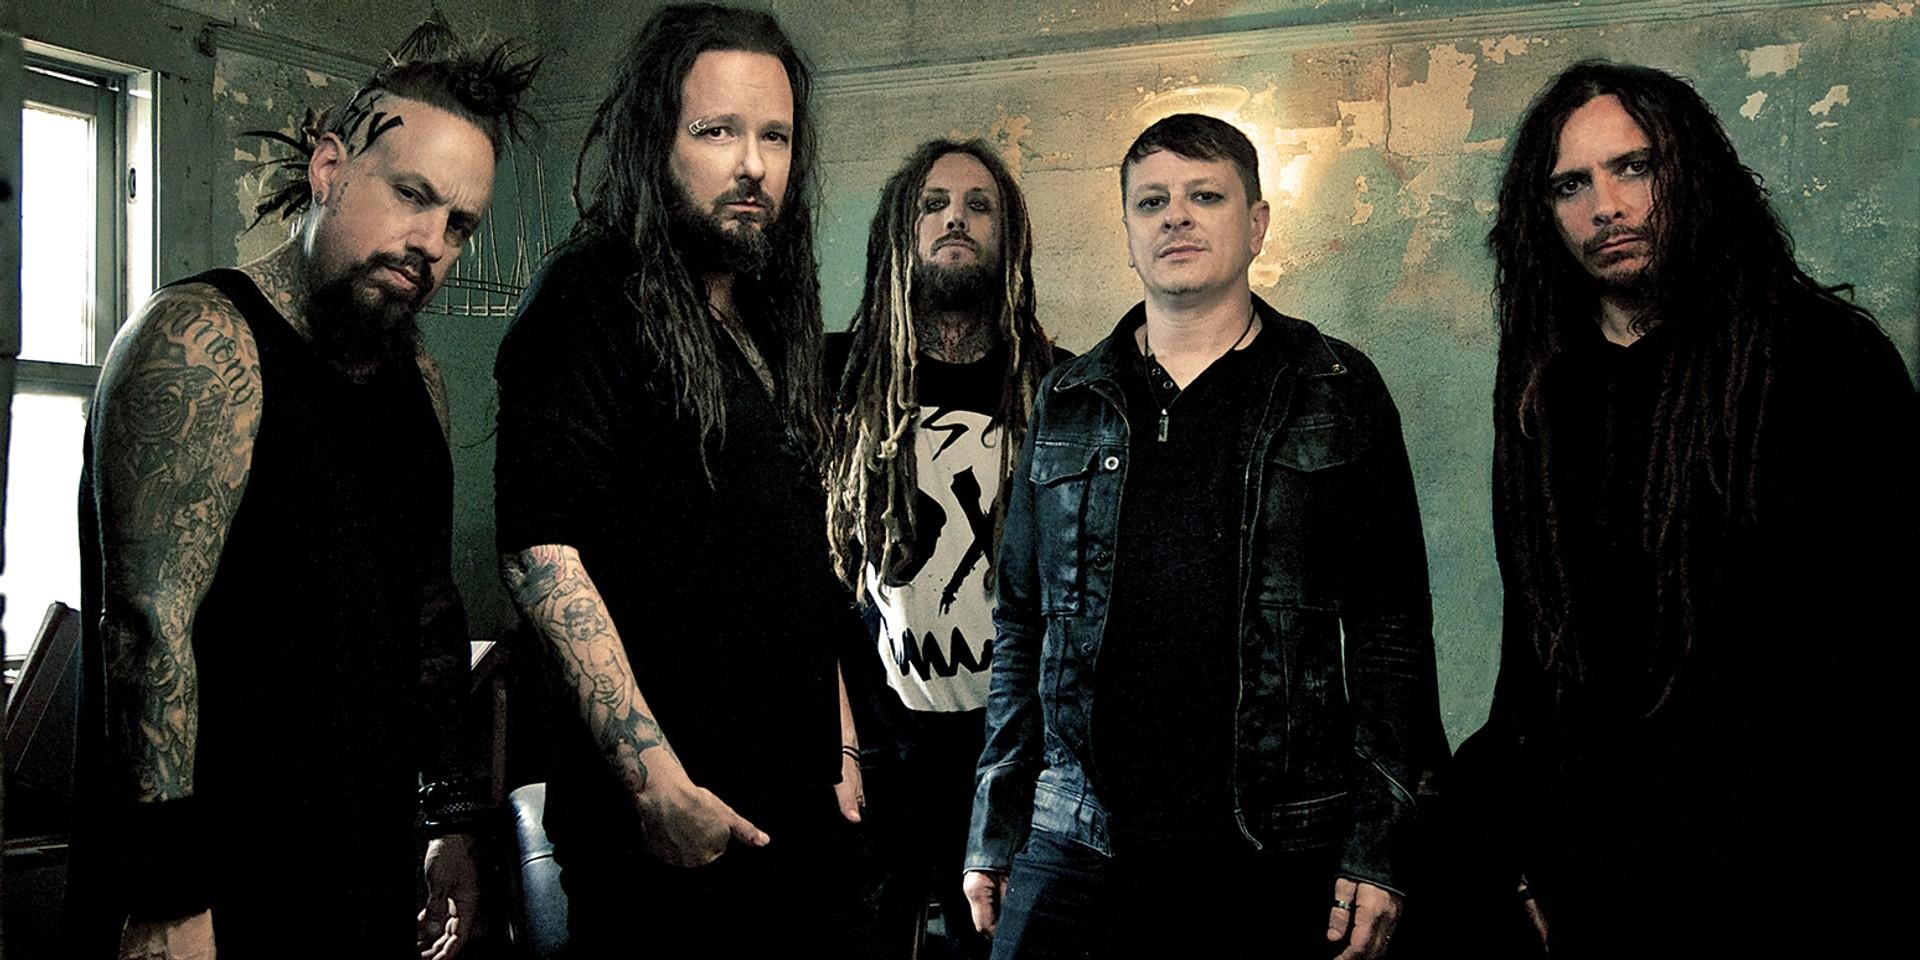 Korn releases new single, 'Cold' – listen